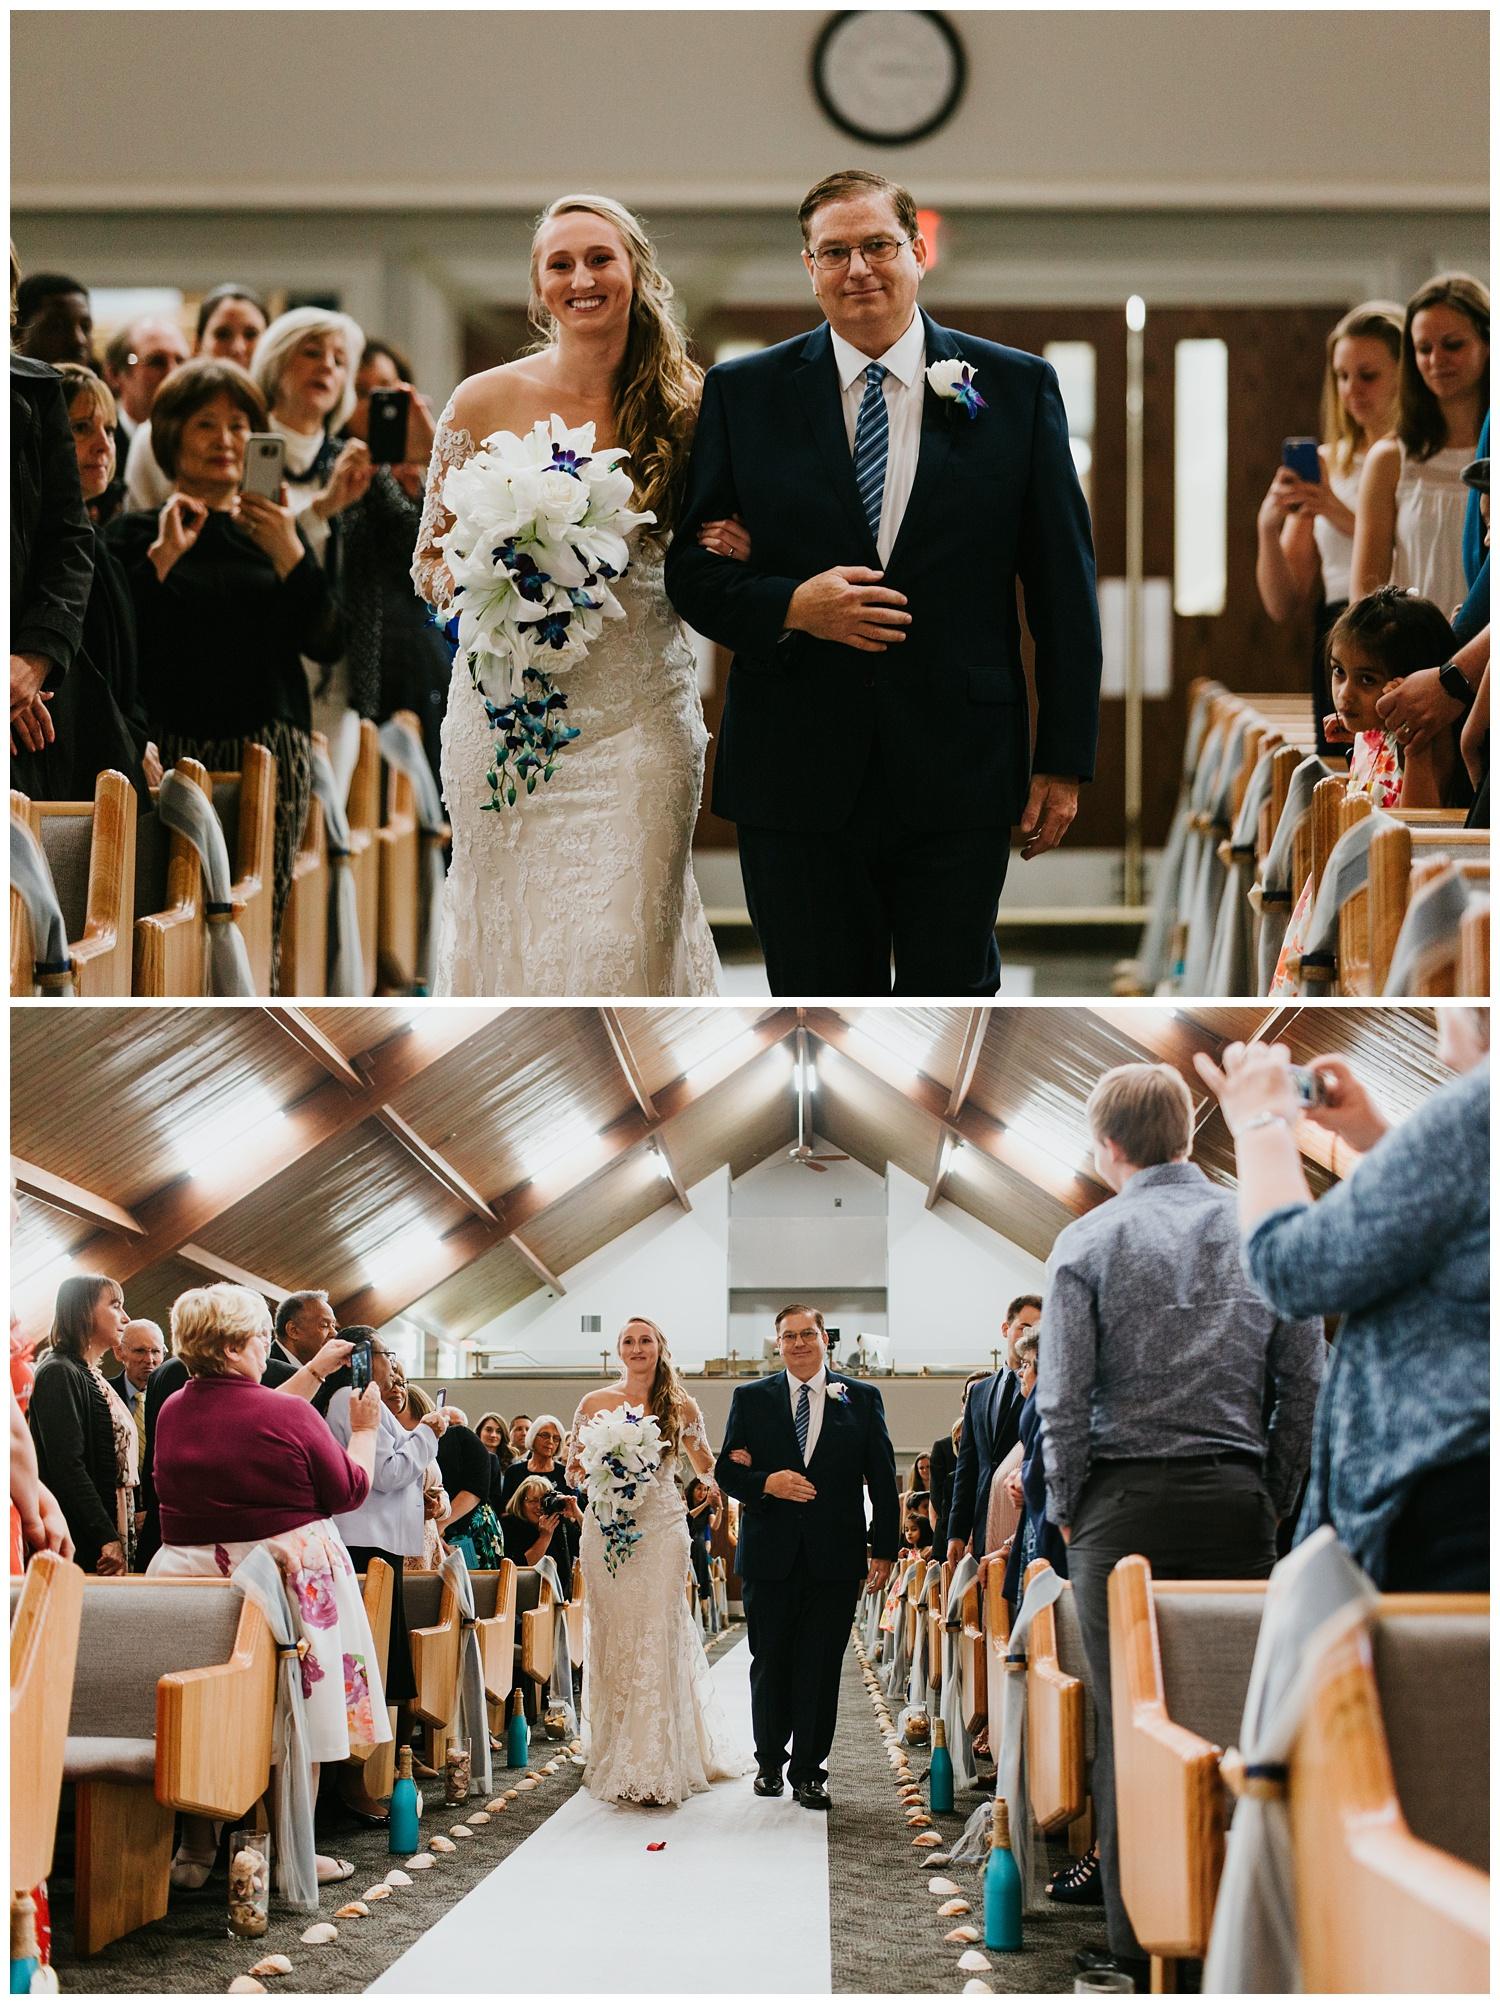 Shadowland Silver Beach St. Joseph Wedding Photographer Rainy Wedding35.jpg